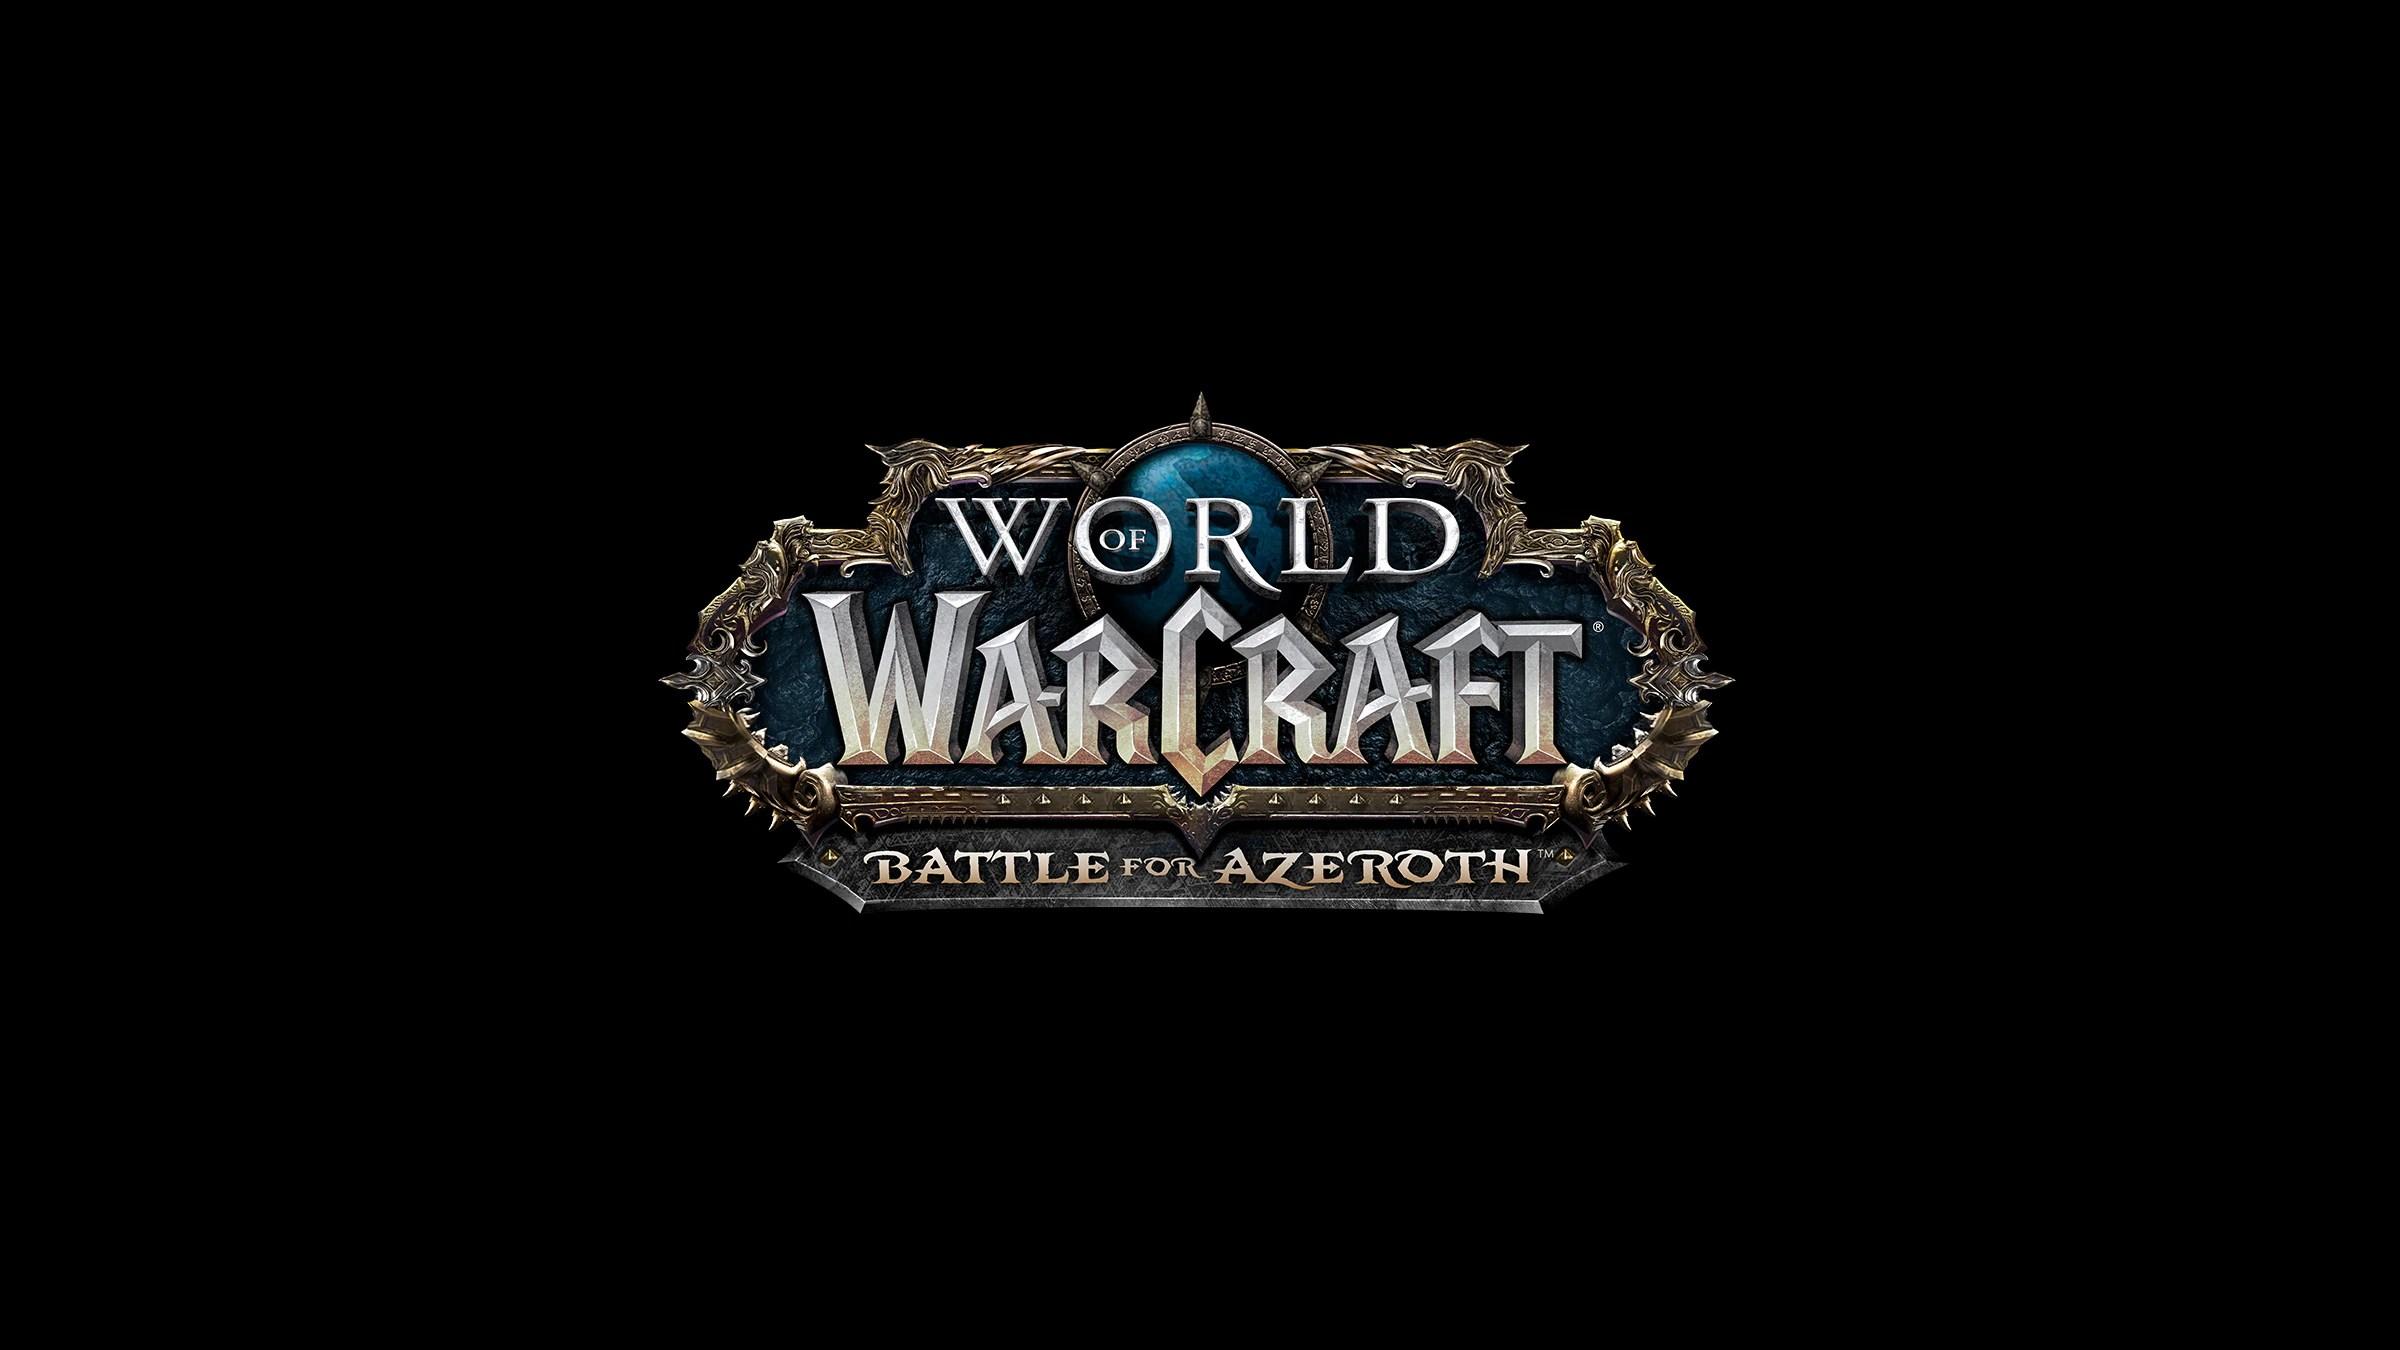 Fall Dual Monitor Wallpaper World Of Warcraft At Blizzcon 2017 World Of Warcraft